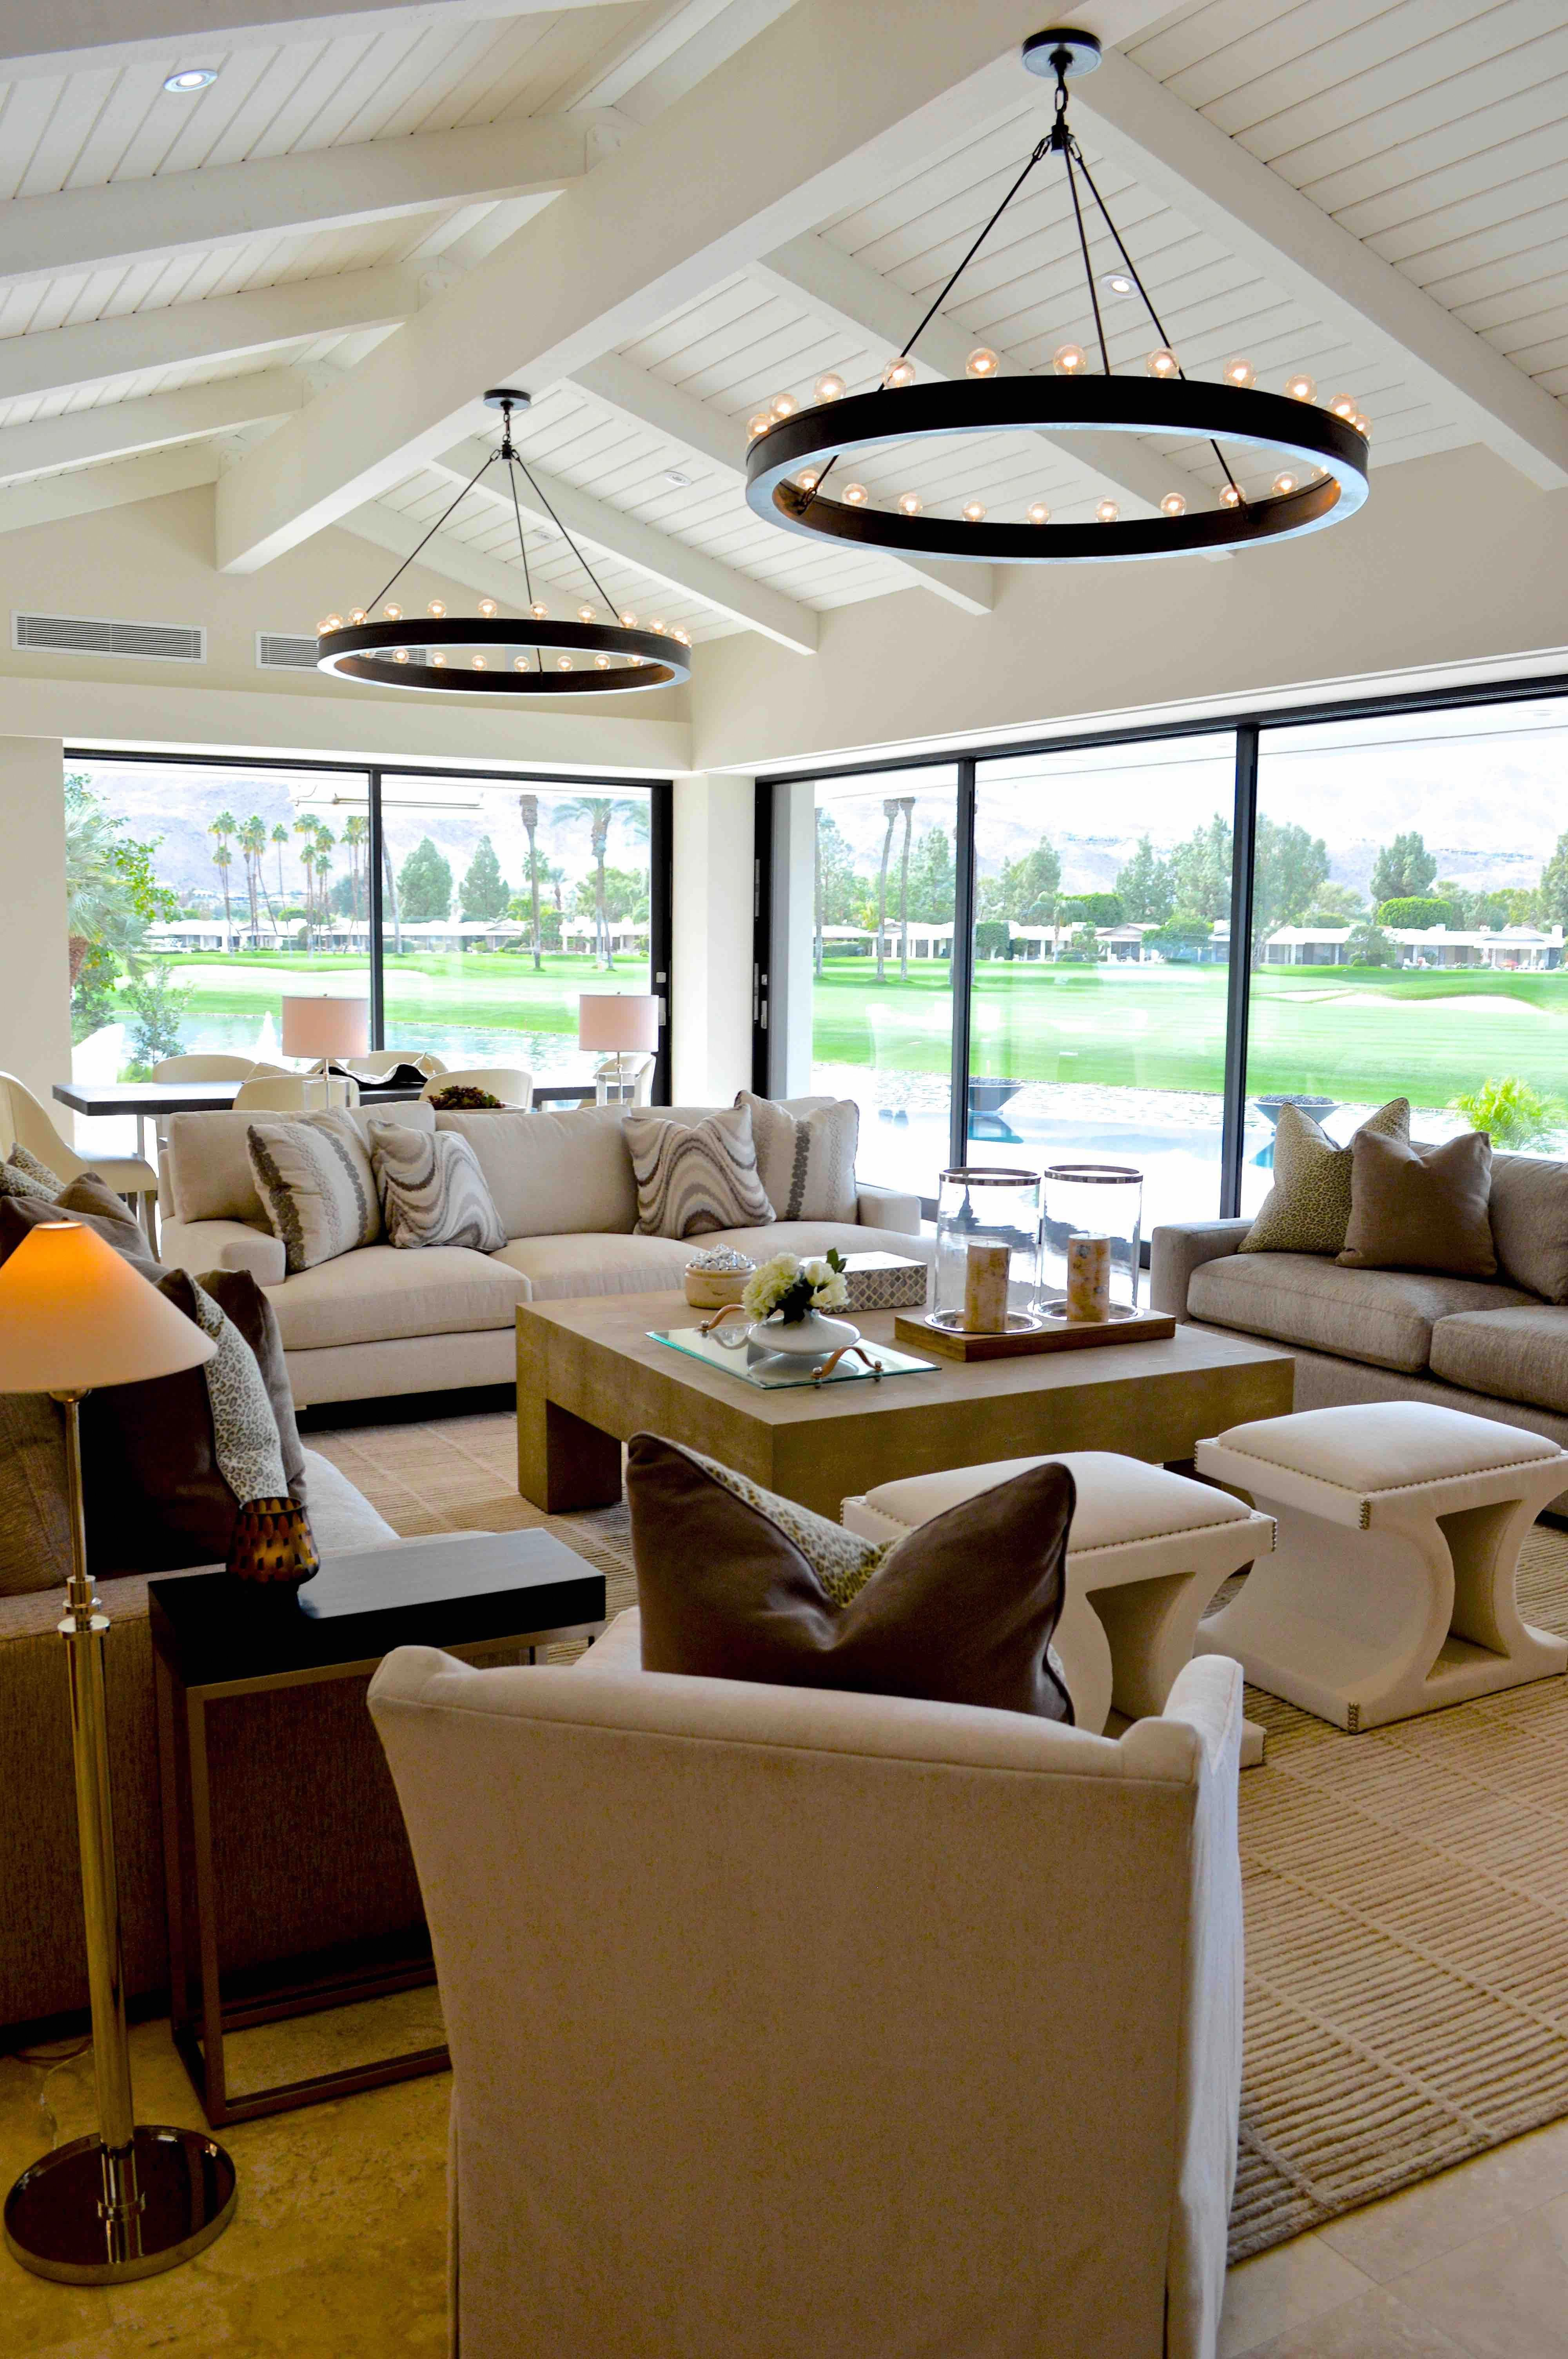 Home Decor Ideas Kerala Interior Design Courses Best Interior Design Kitchen Design Color